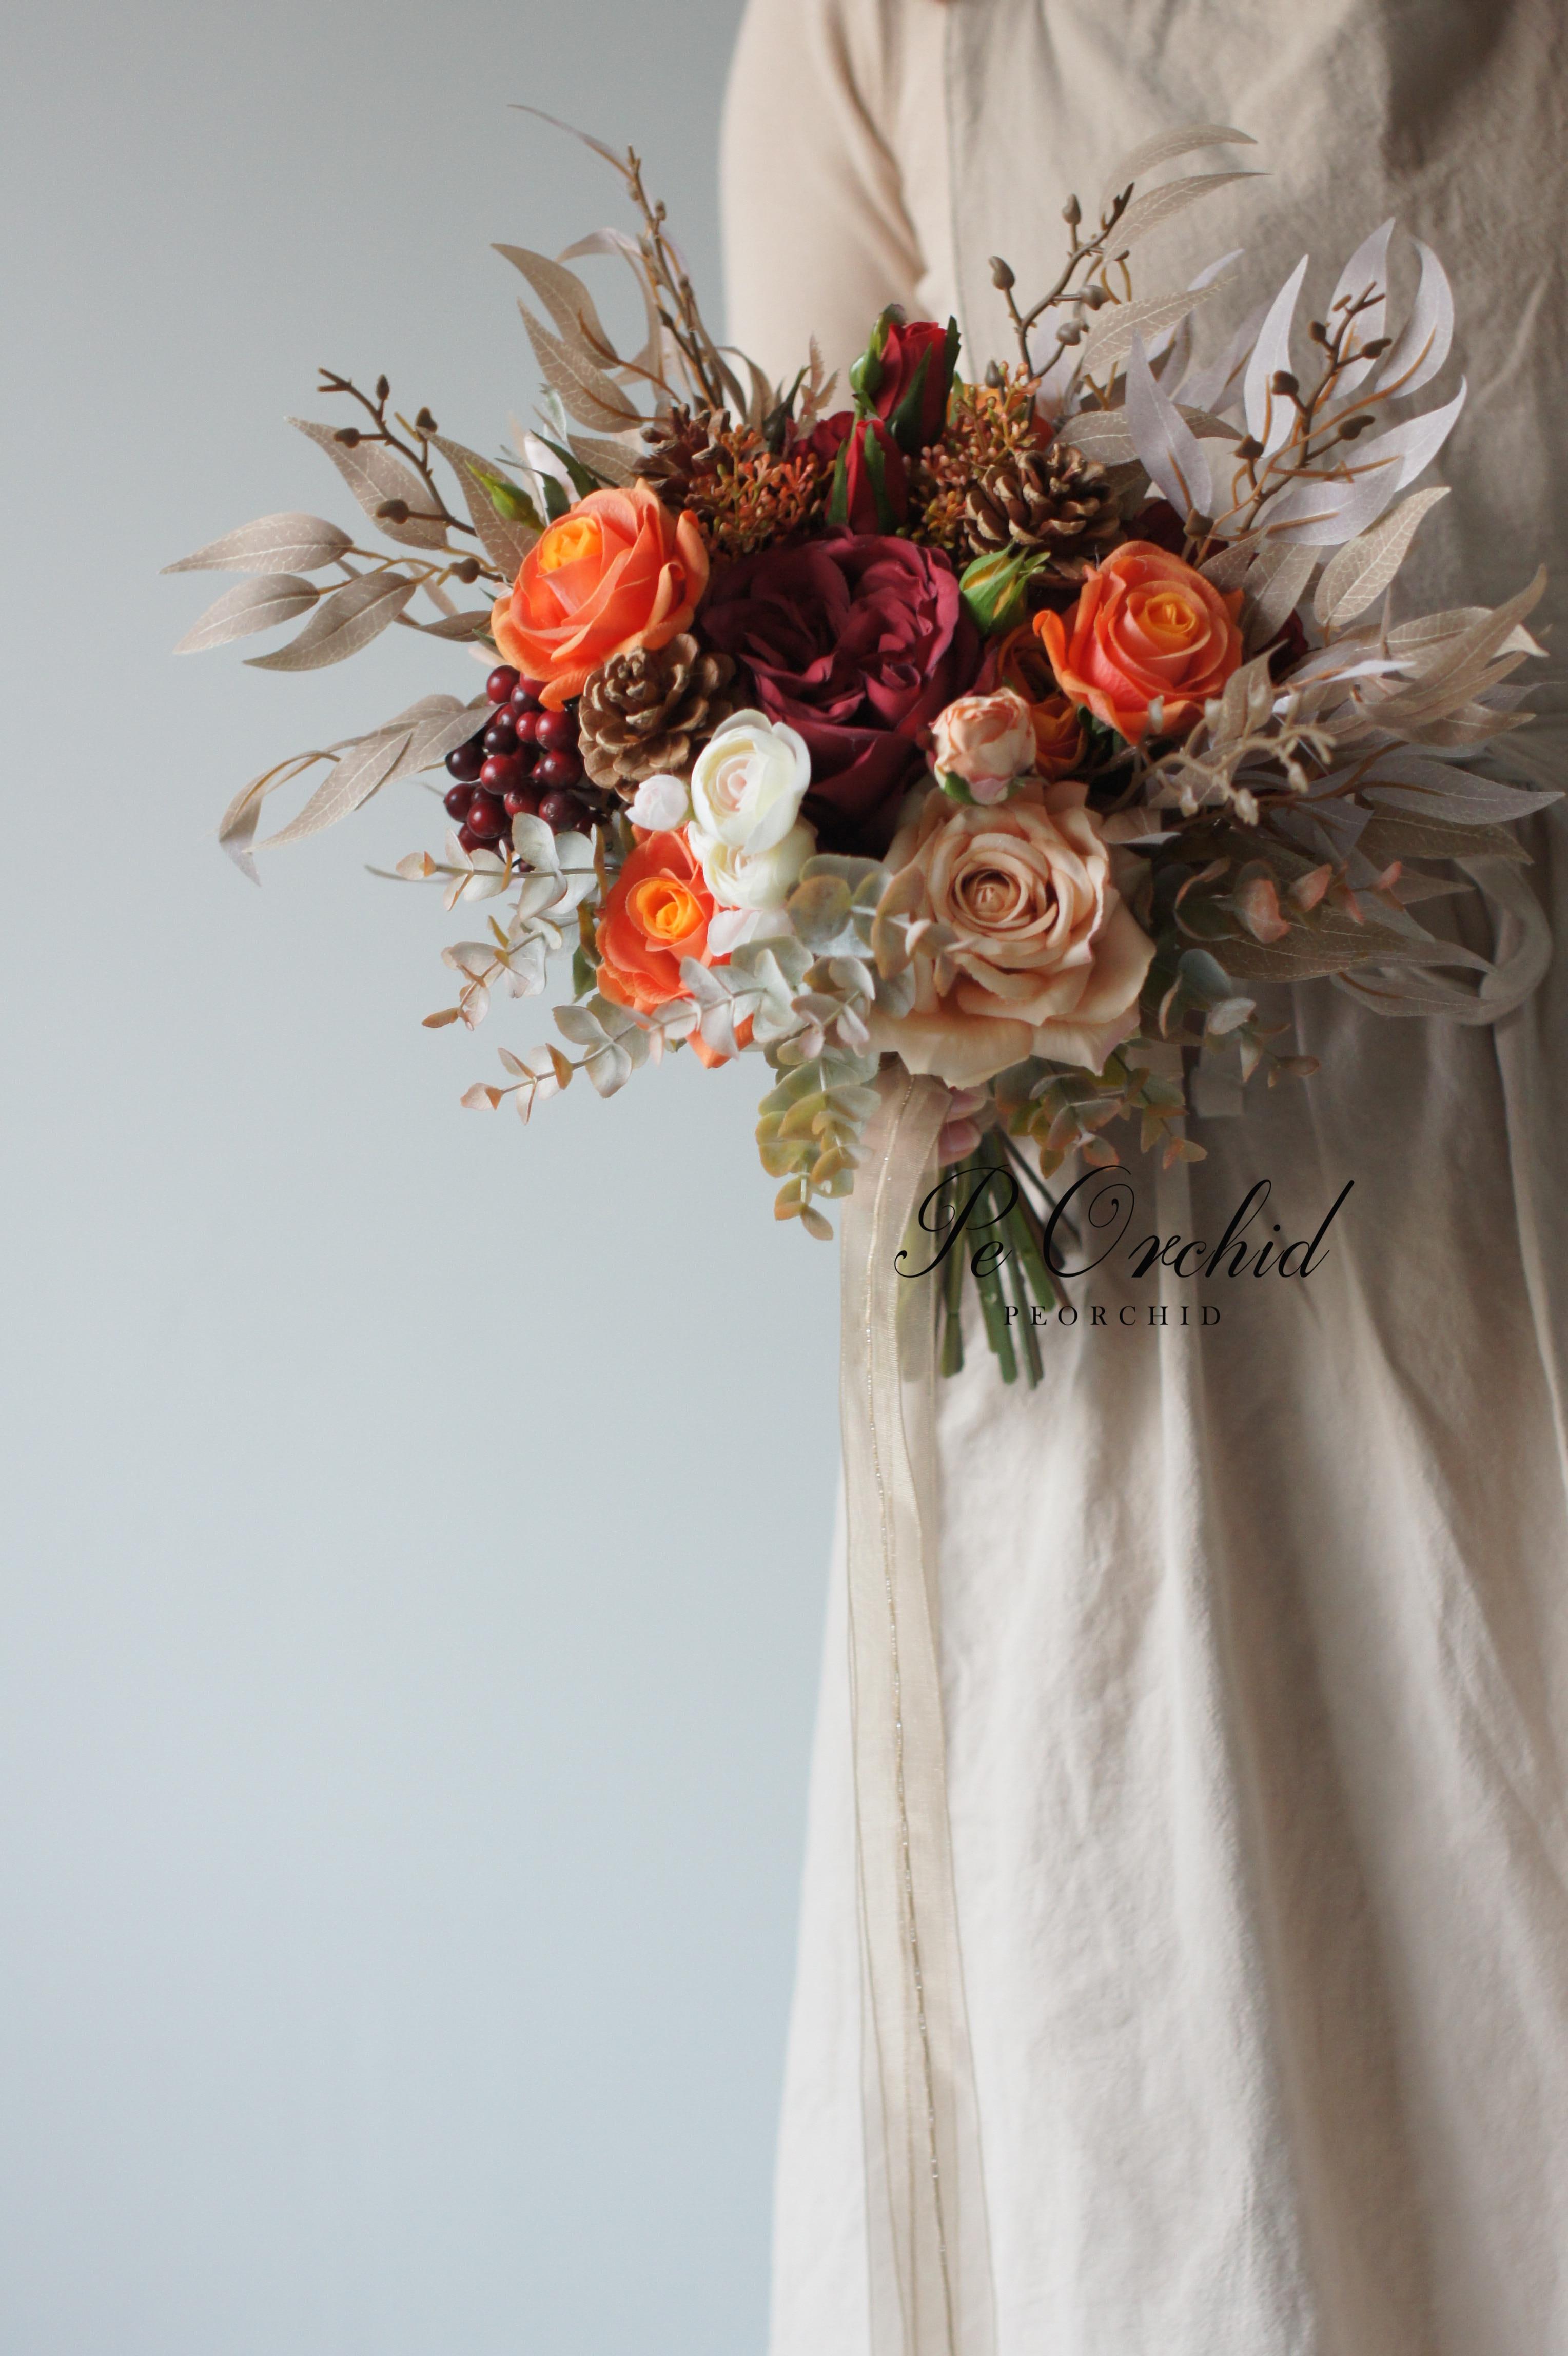 PEORCHID Artificial Orange Red Wedding Bouquets Roses Silk flower Bride Hand Bouquet Decoration Mariage